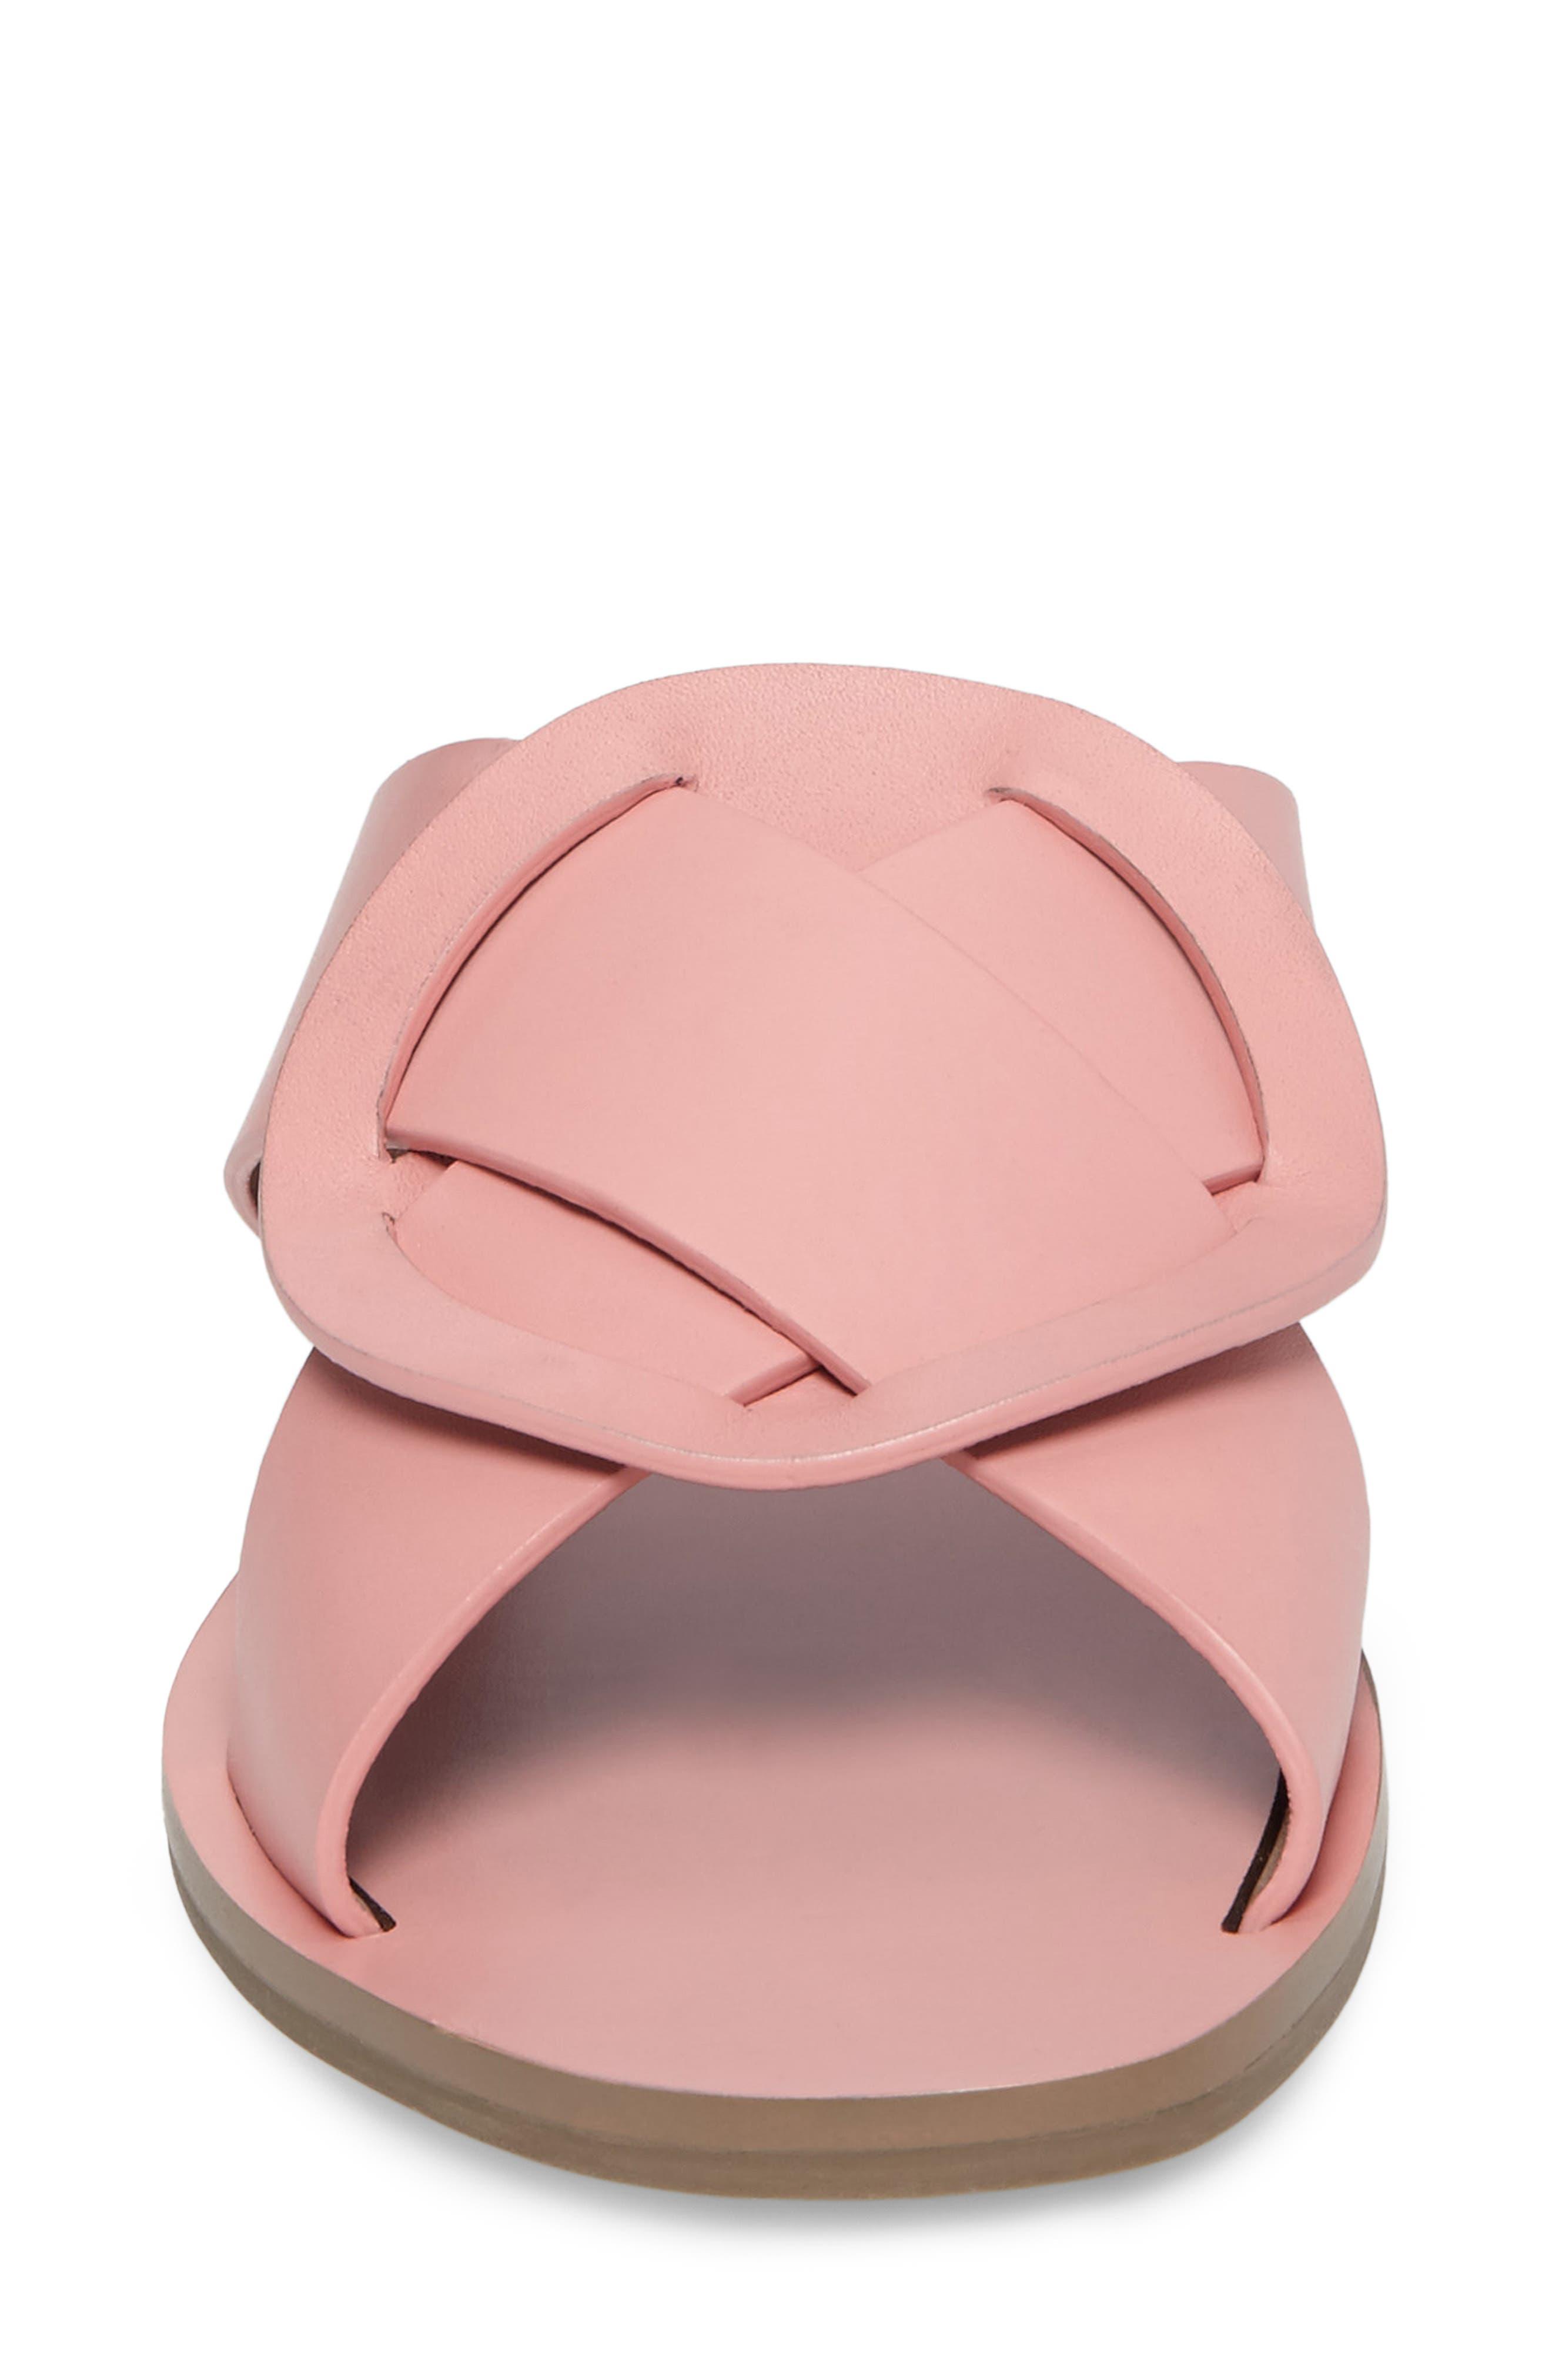 Carlein Slide Sandal,                             Alternate thumbnail 5, color,                             Pink Peony Leather